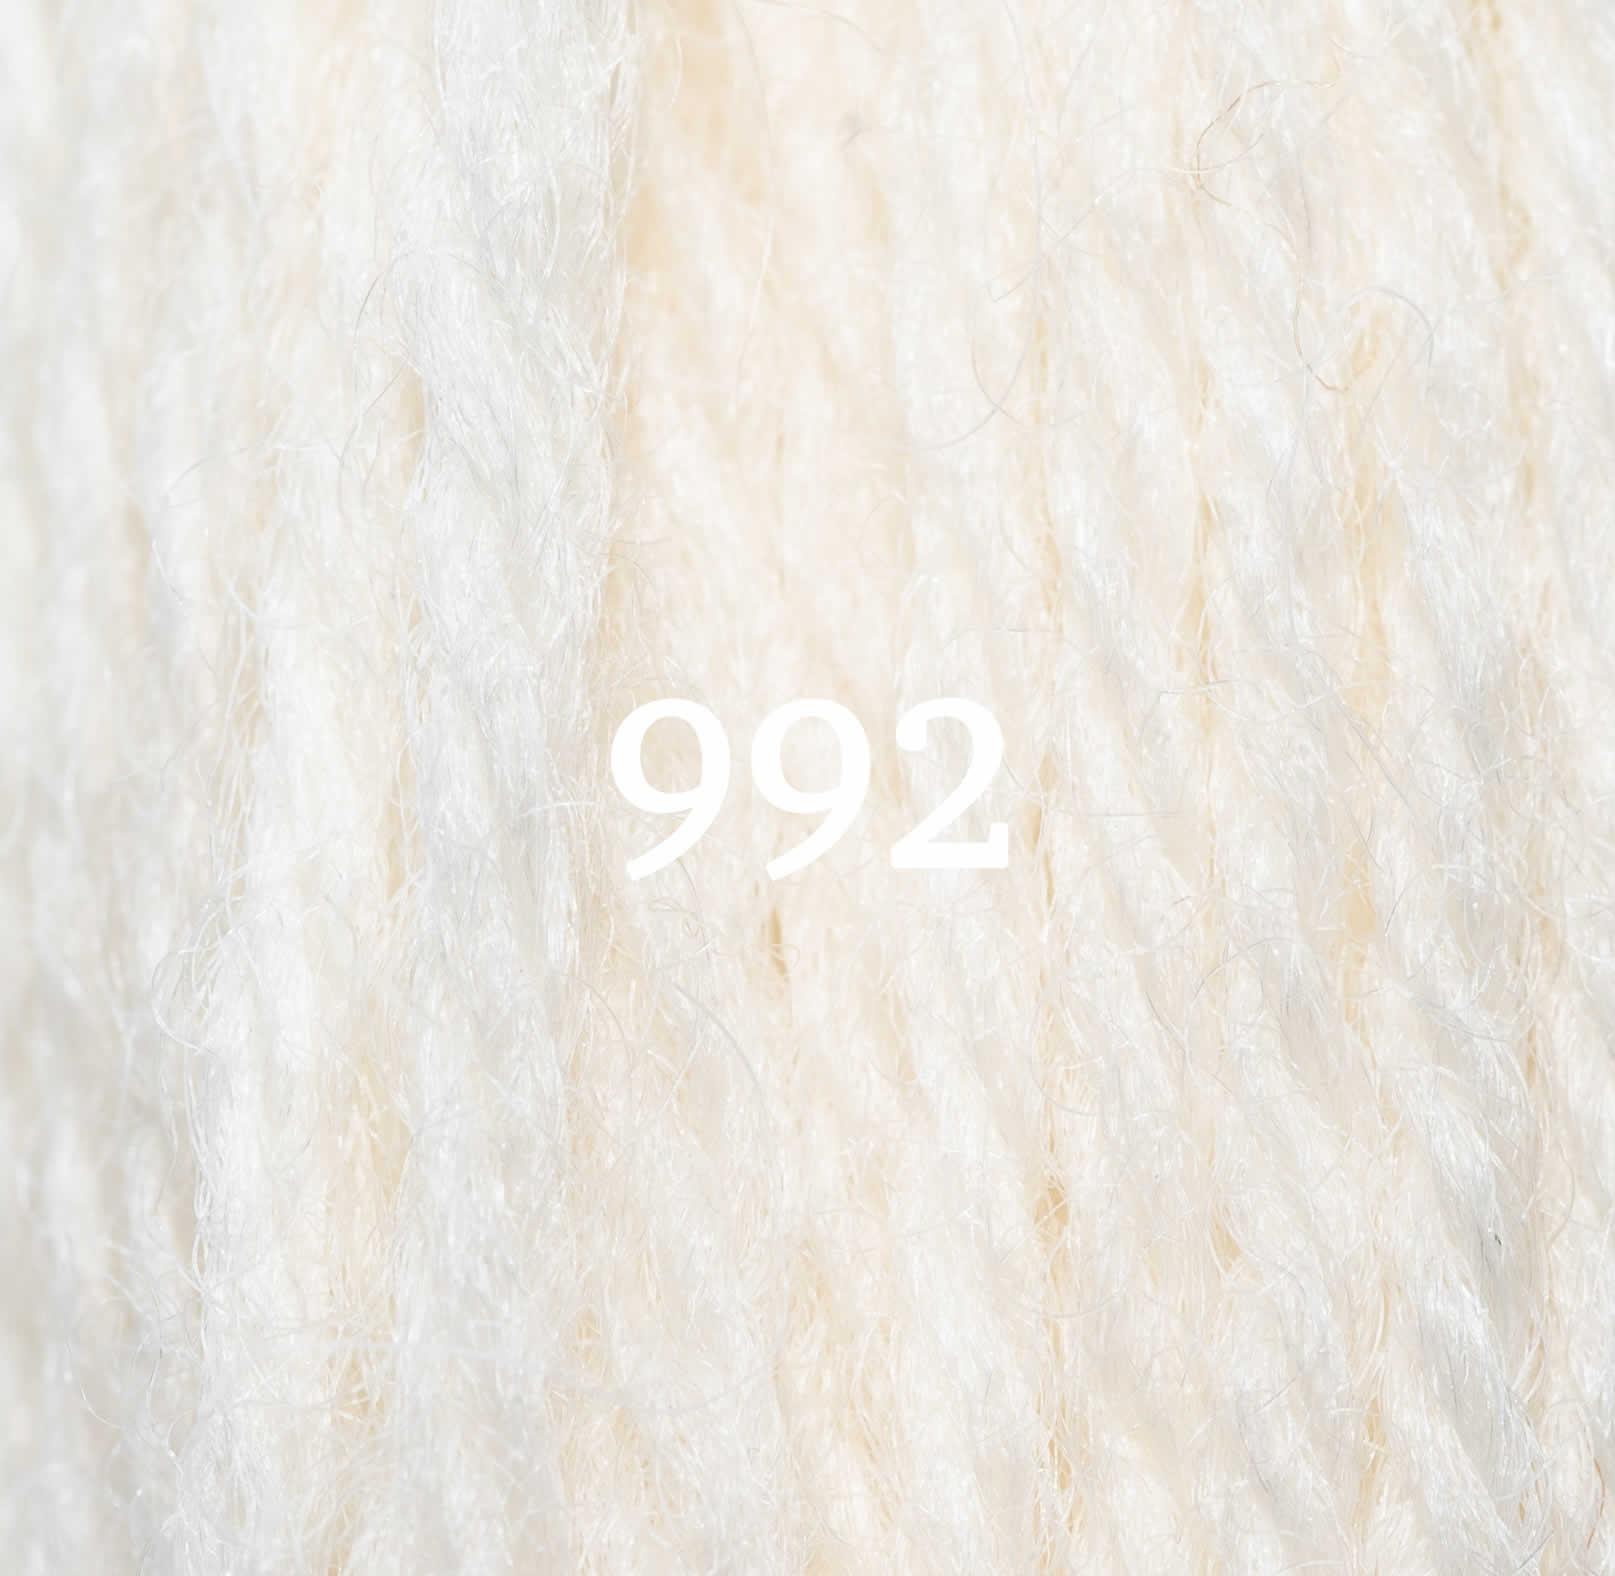 Off-White-992